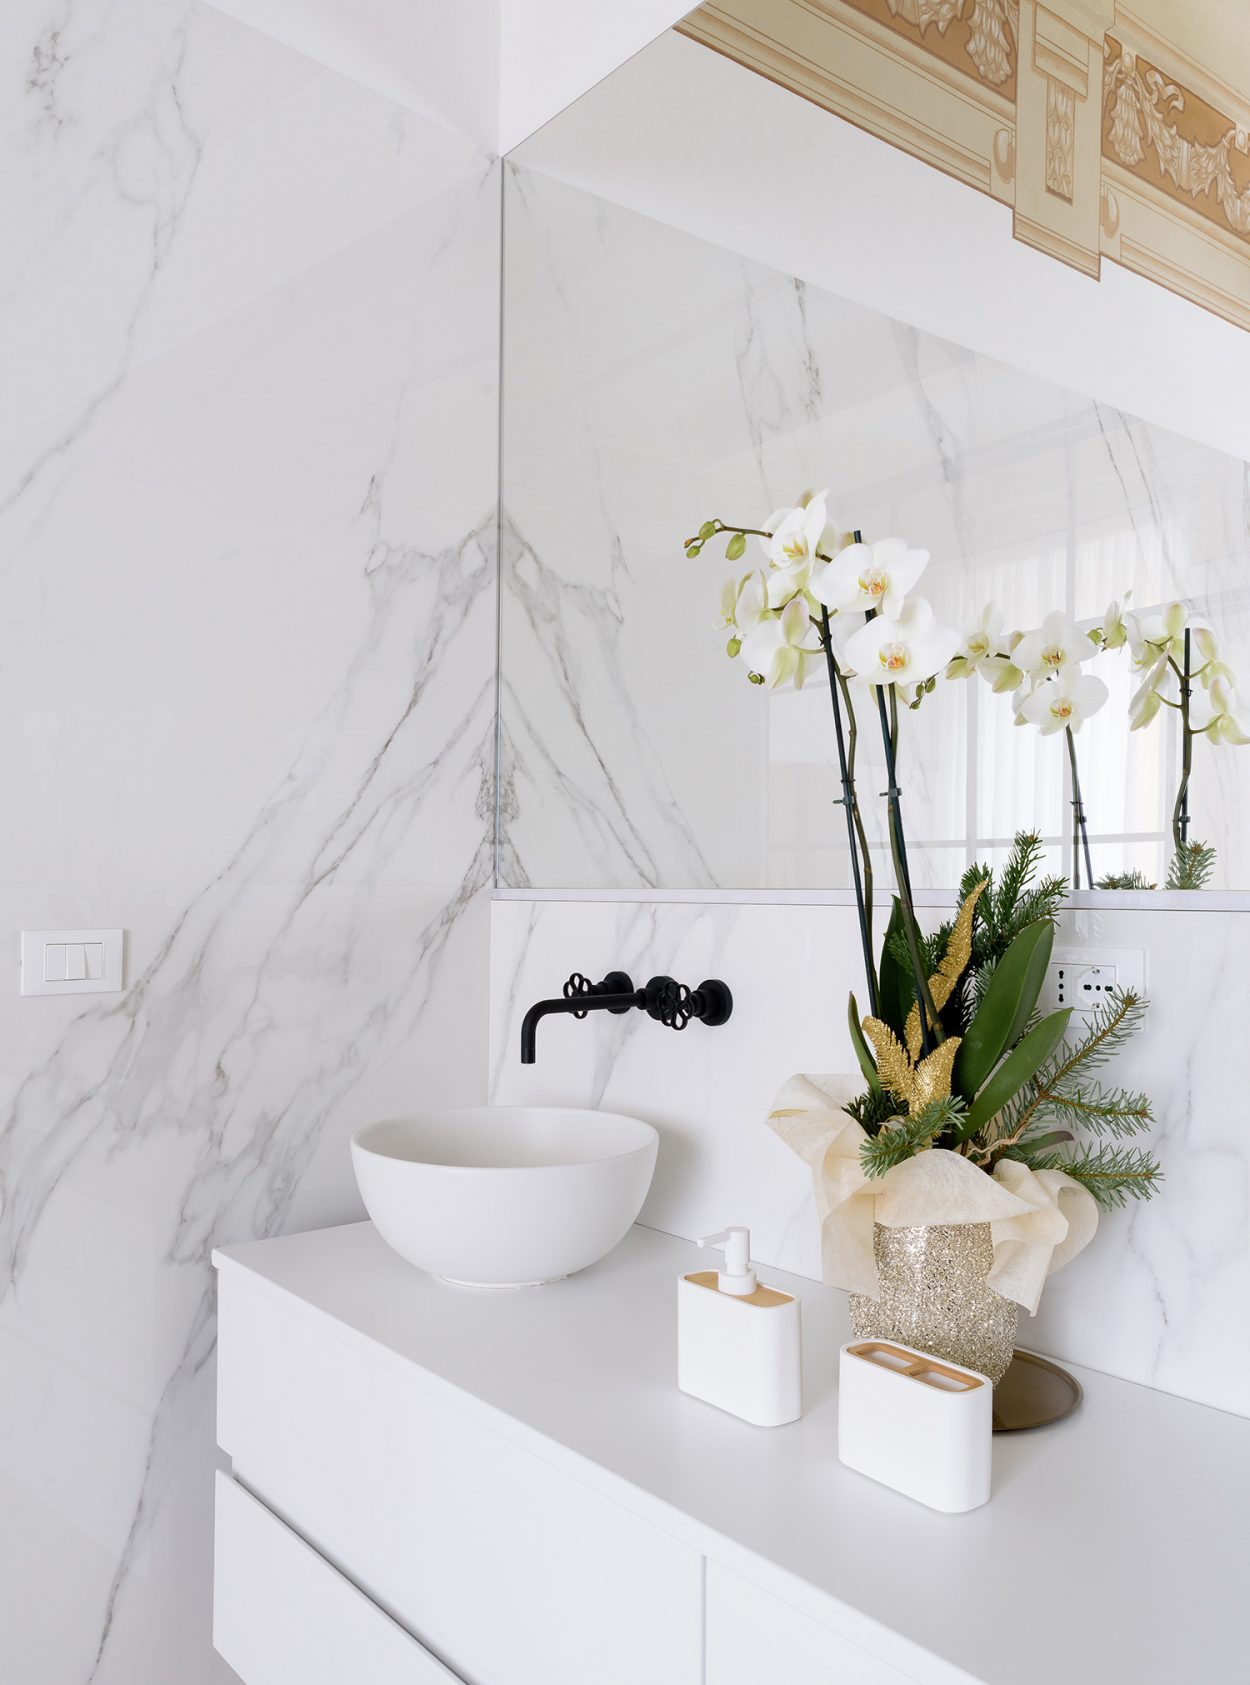 11-Ristrutturazione-Appartamento-Cesena-di-qualità-1250x1685.jpg